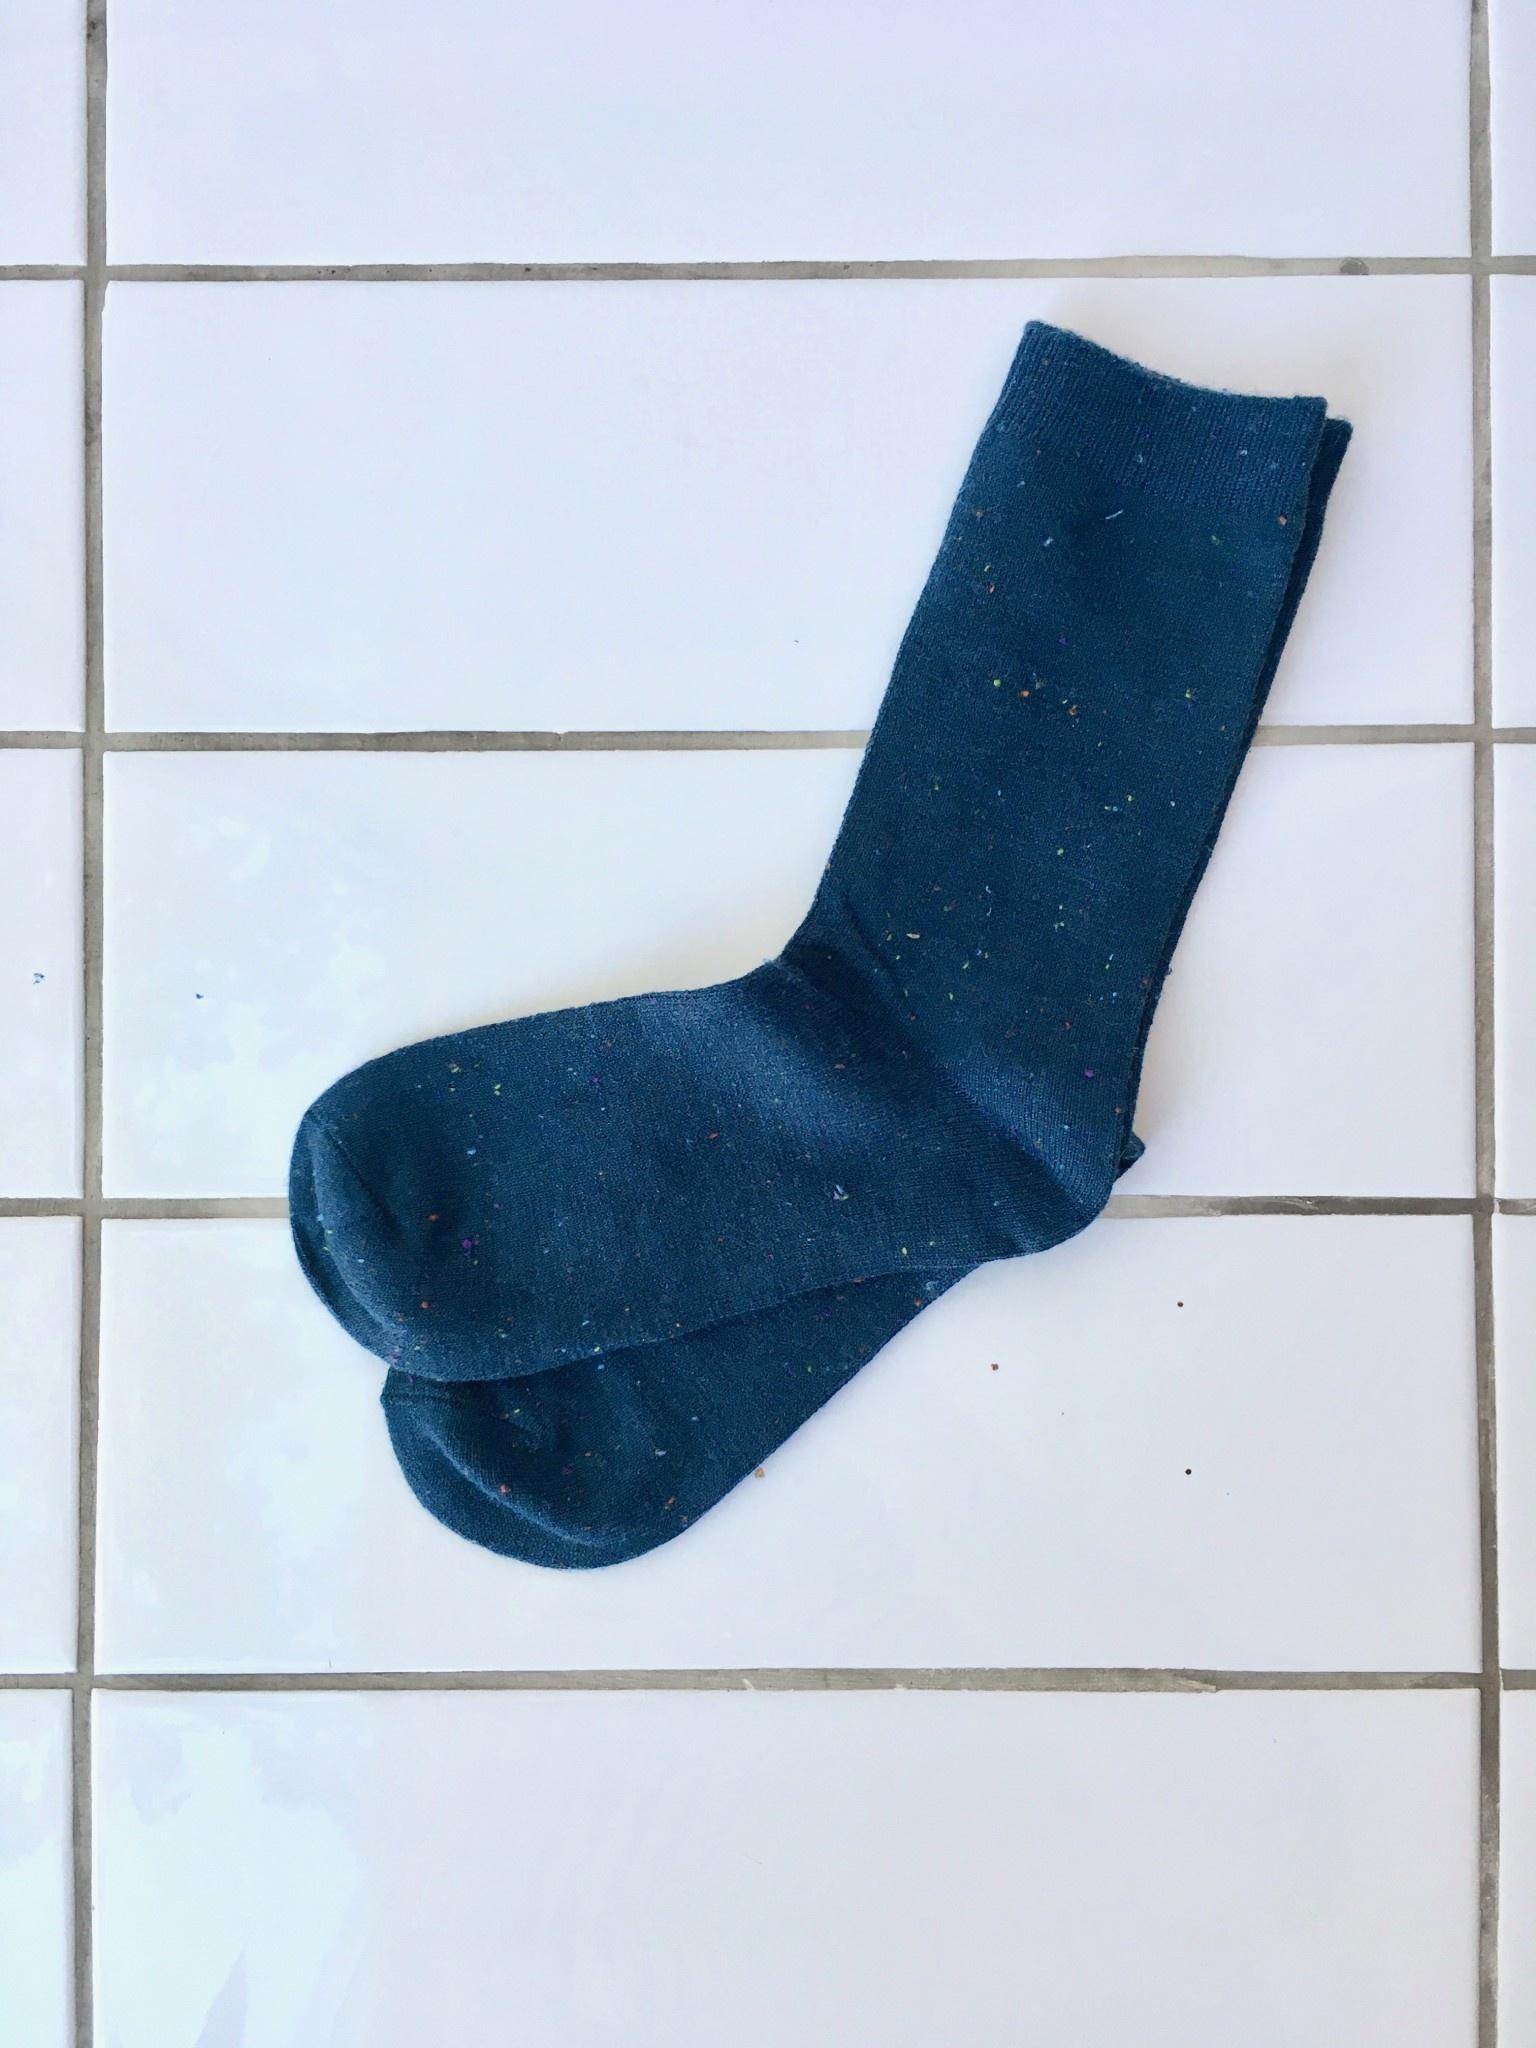 XS Unified Confetti Socks